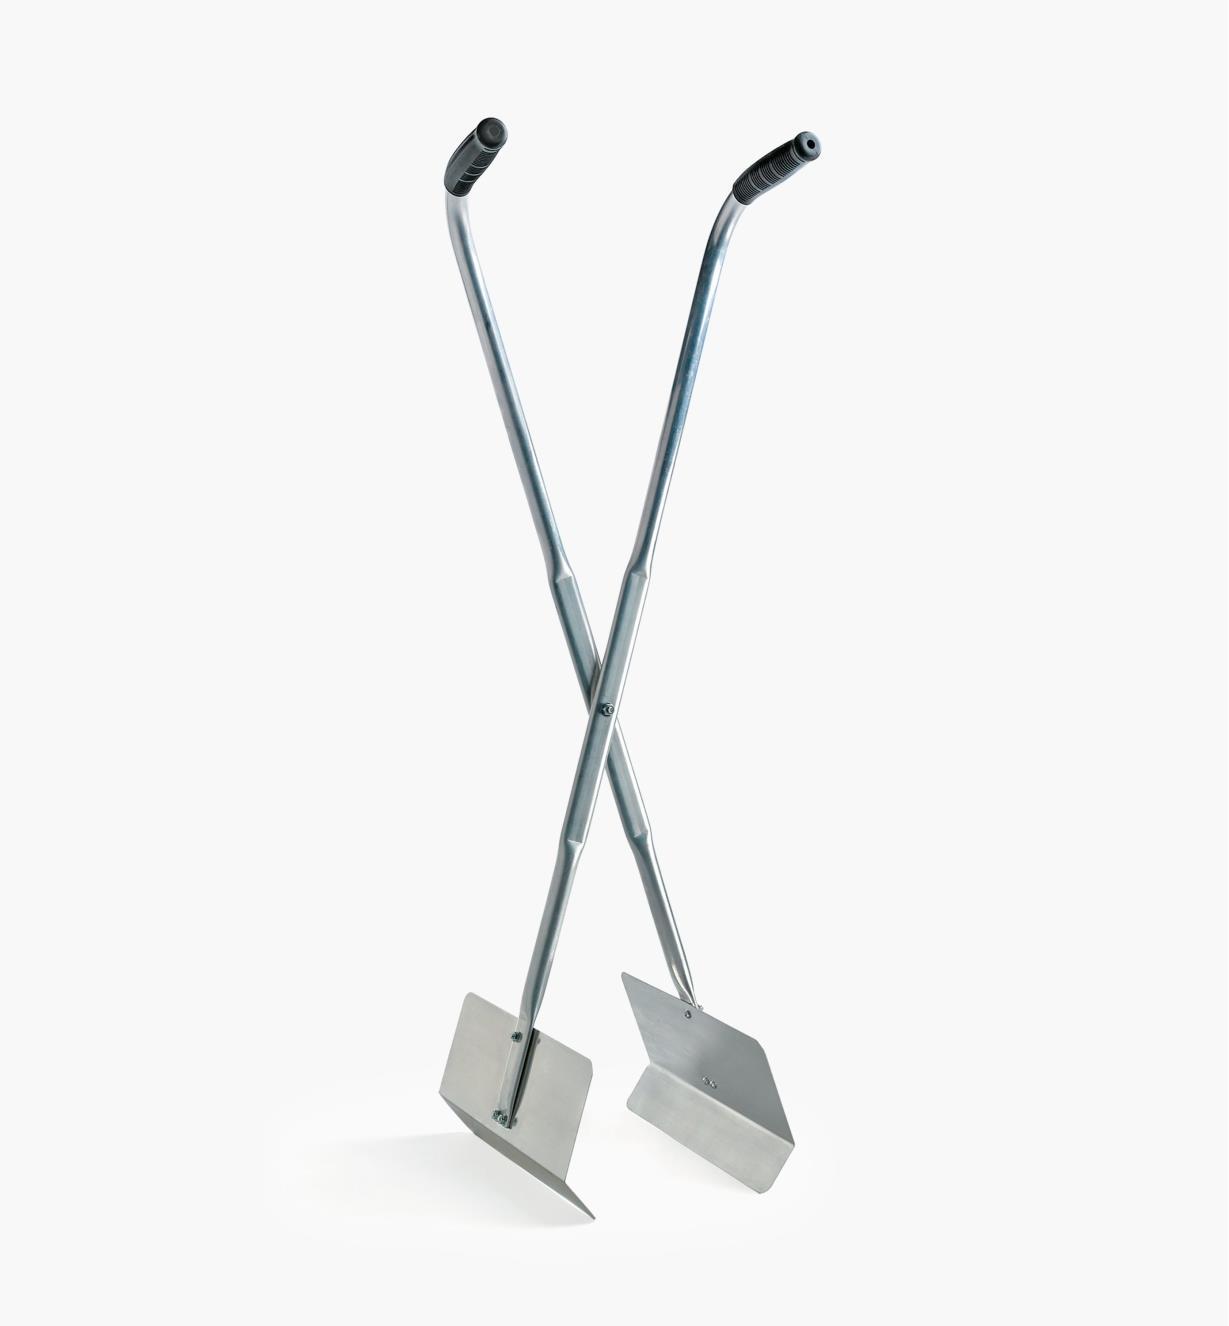 XM515 - Grab Poles